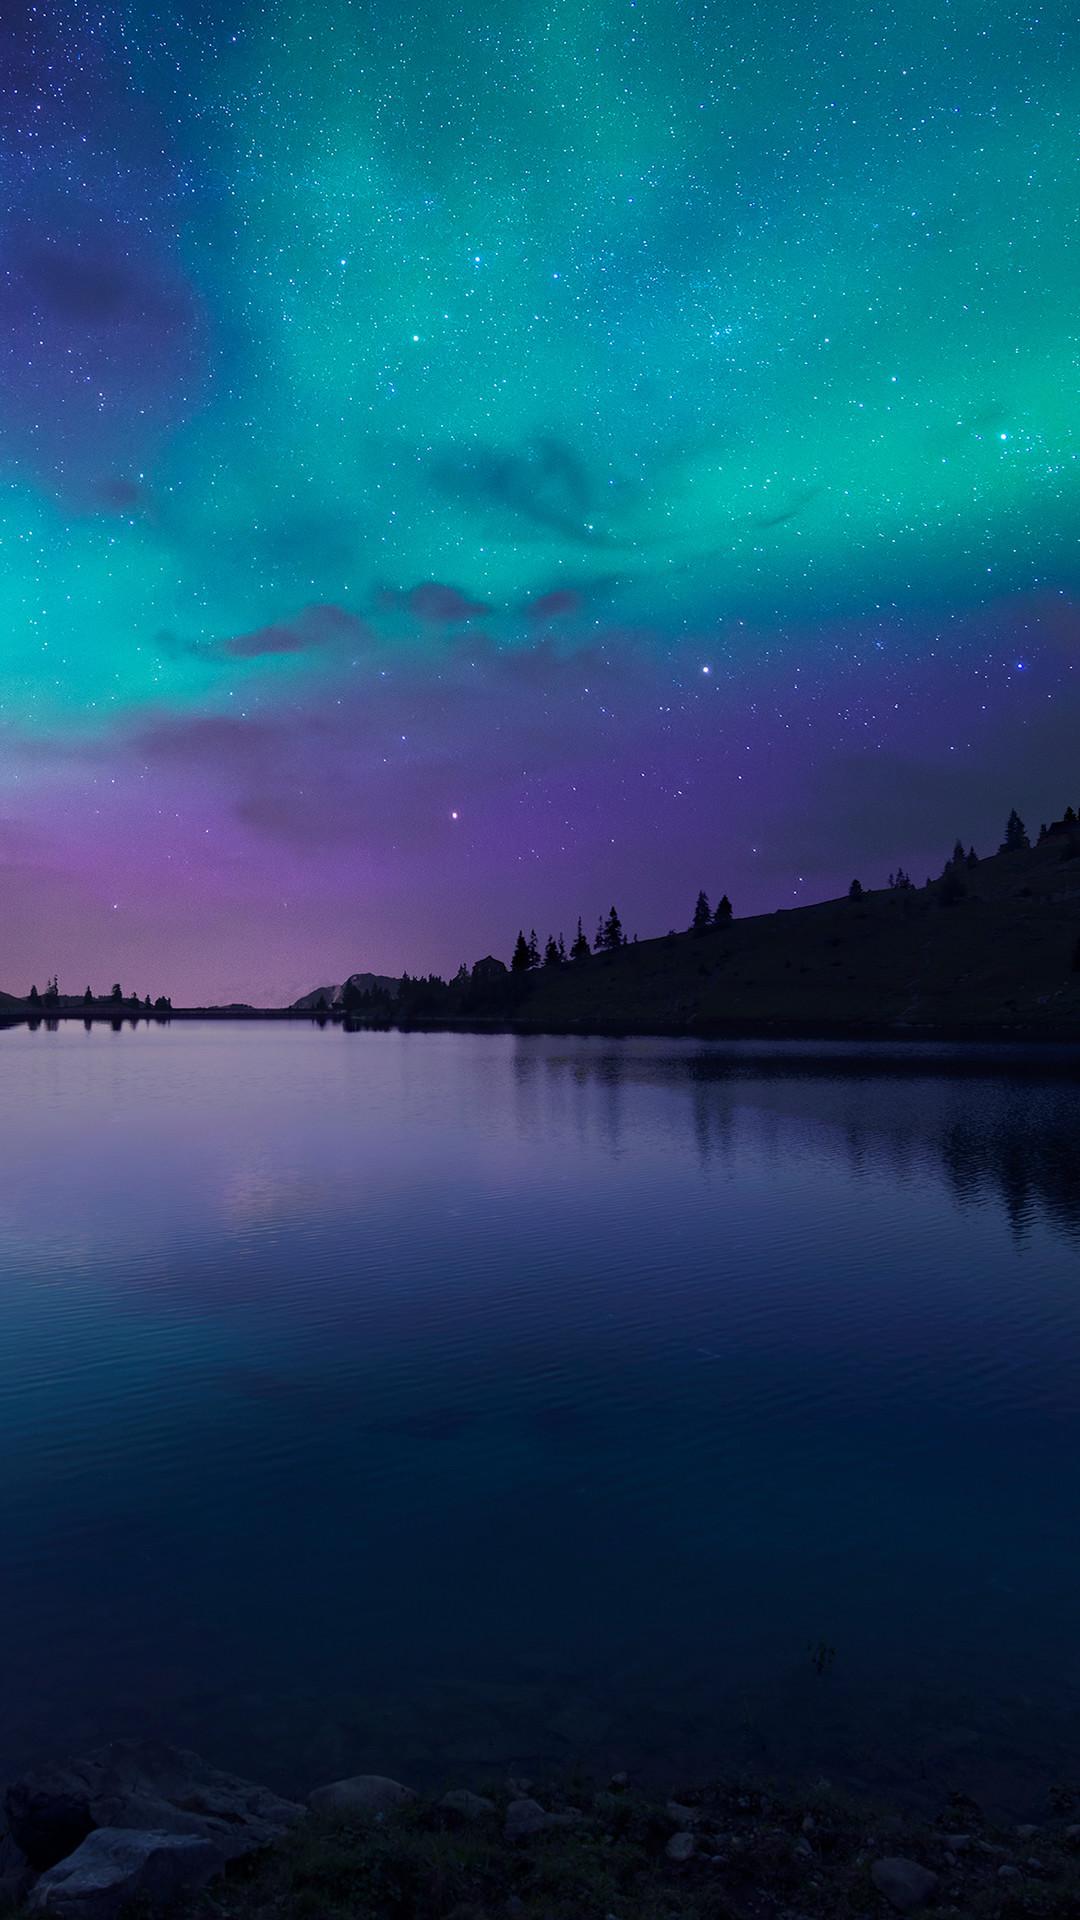 night gall at lake aurora iphone 6